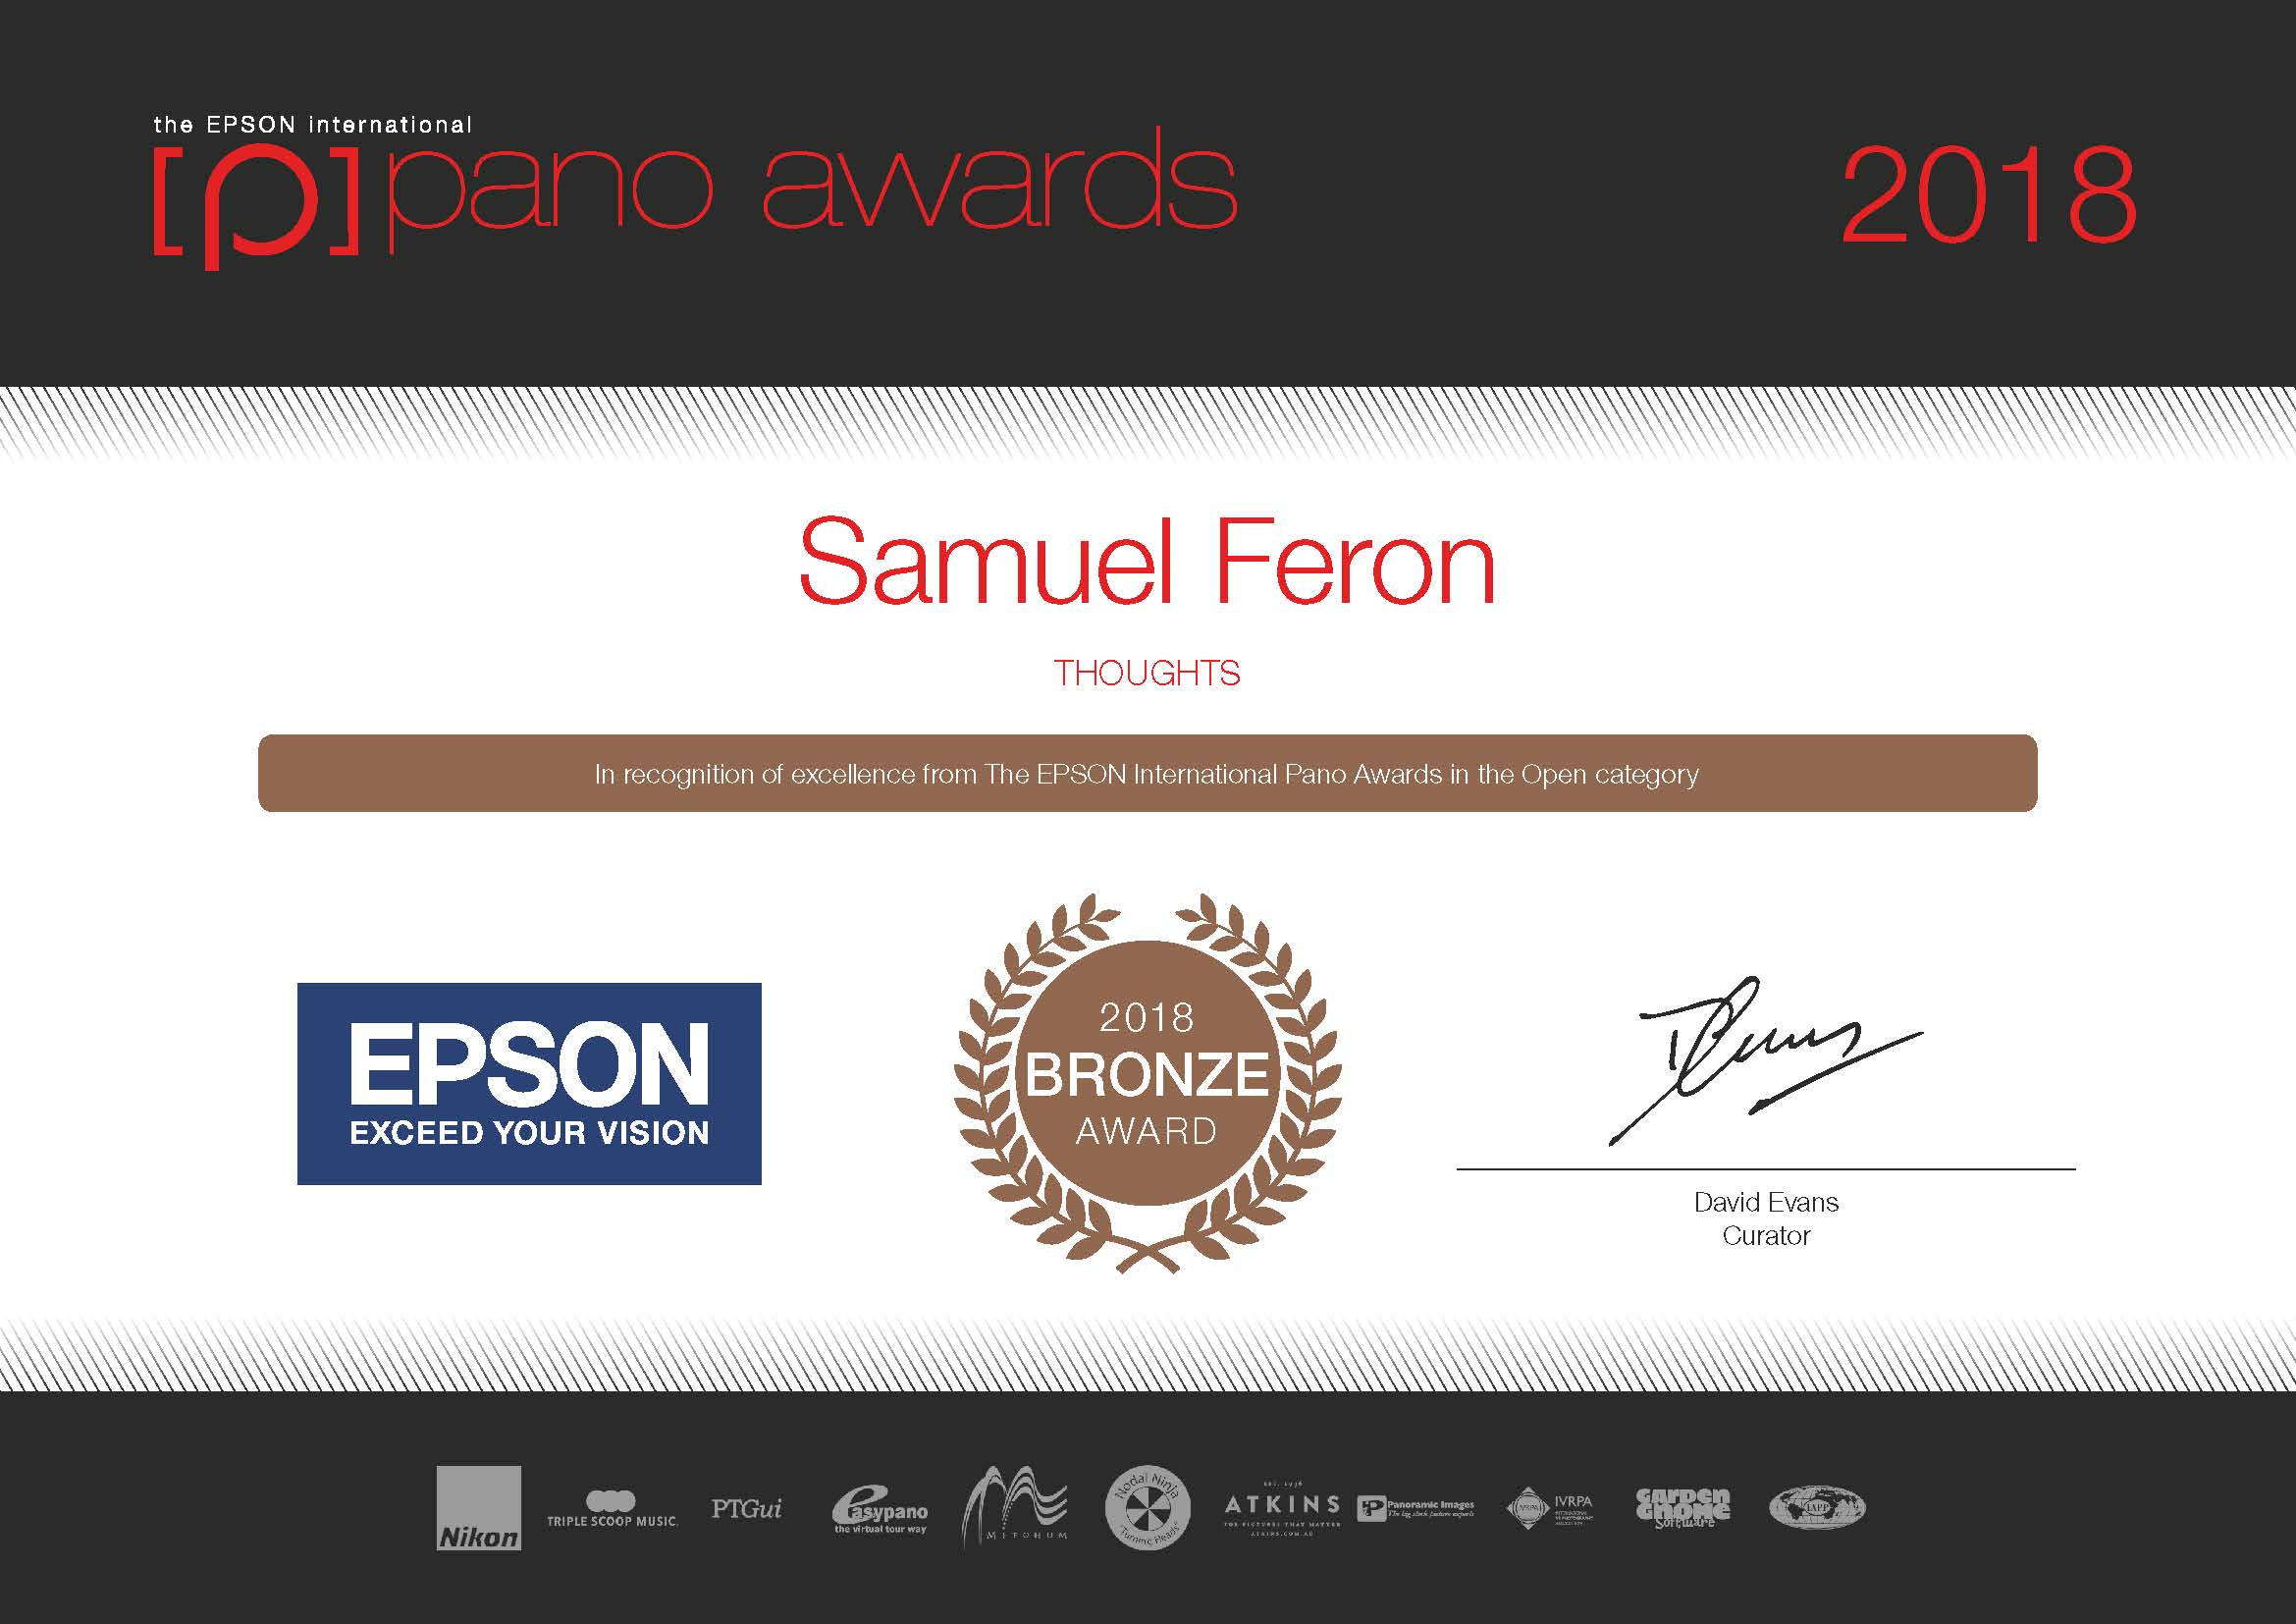 2018-Epson-Pano-Awards-Open-Bronze-746 certif.jpg